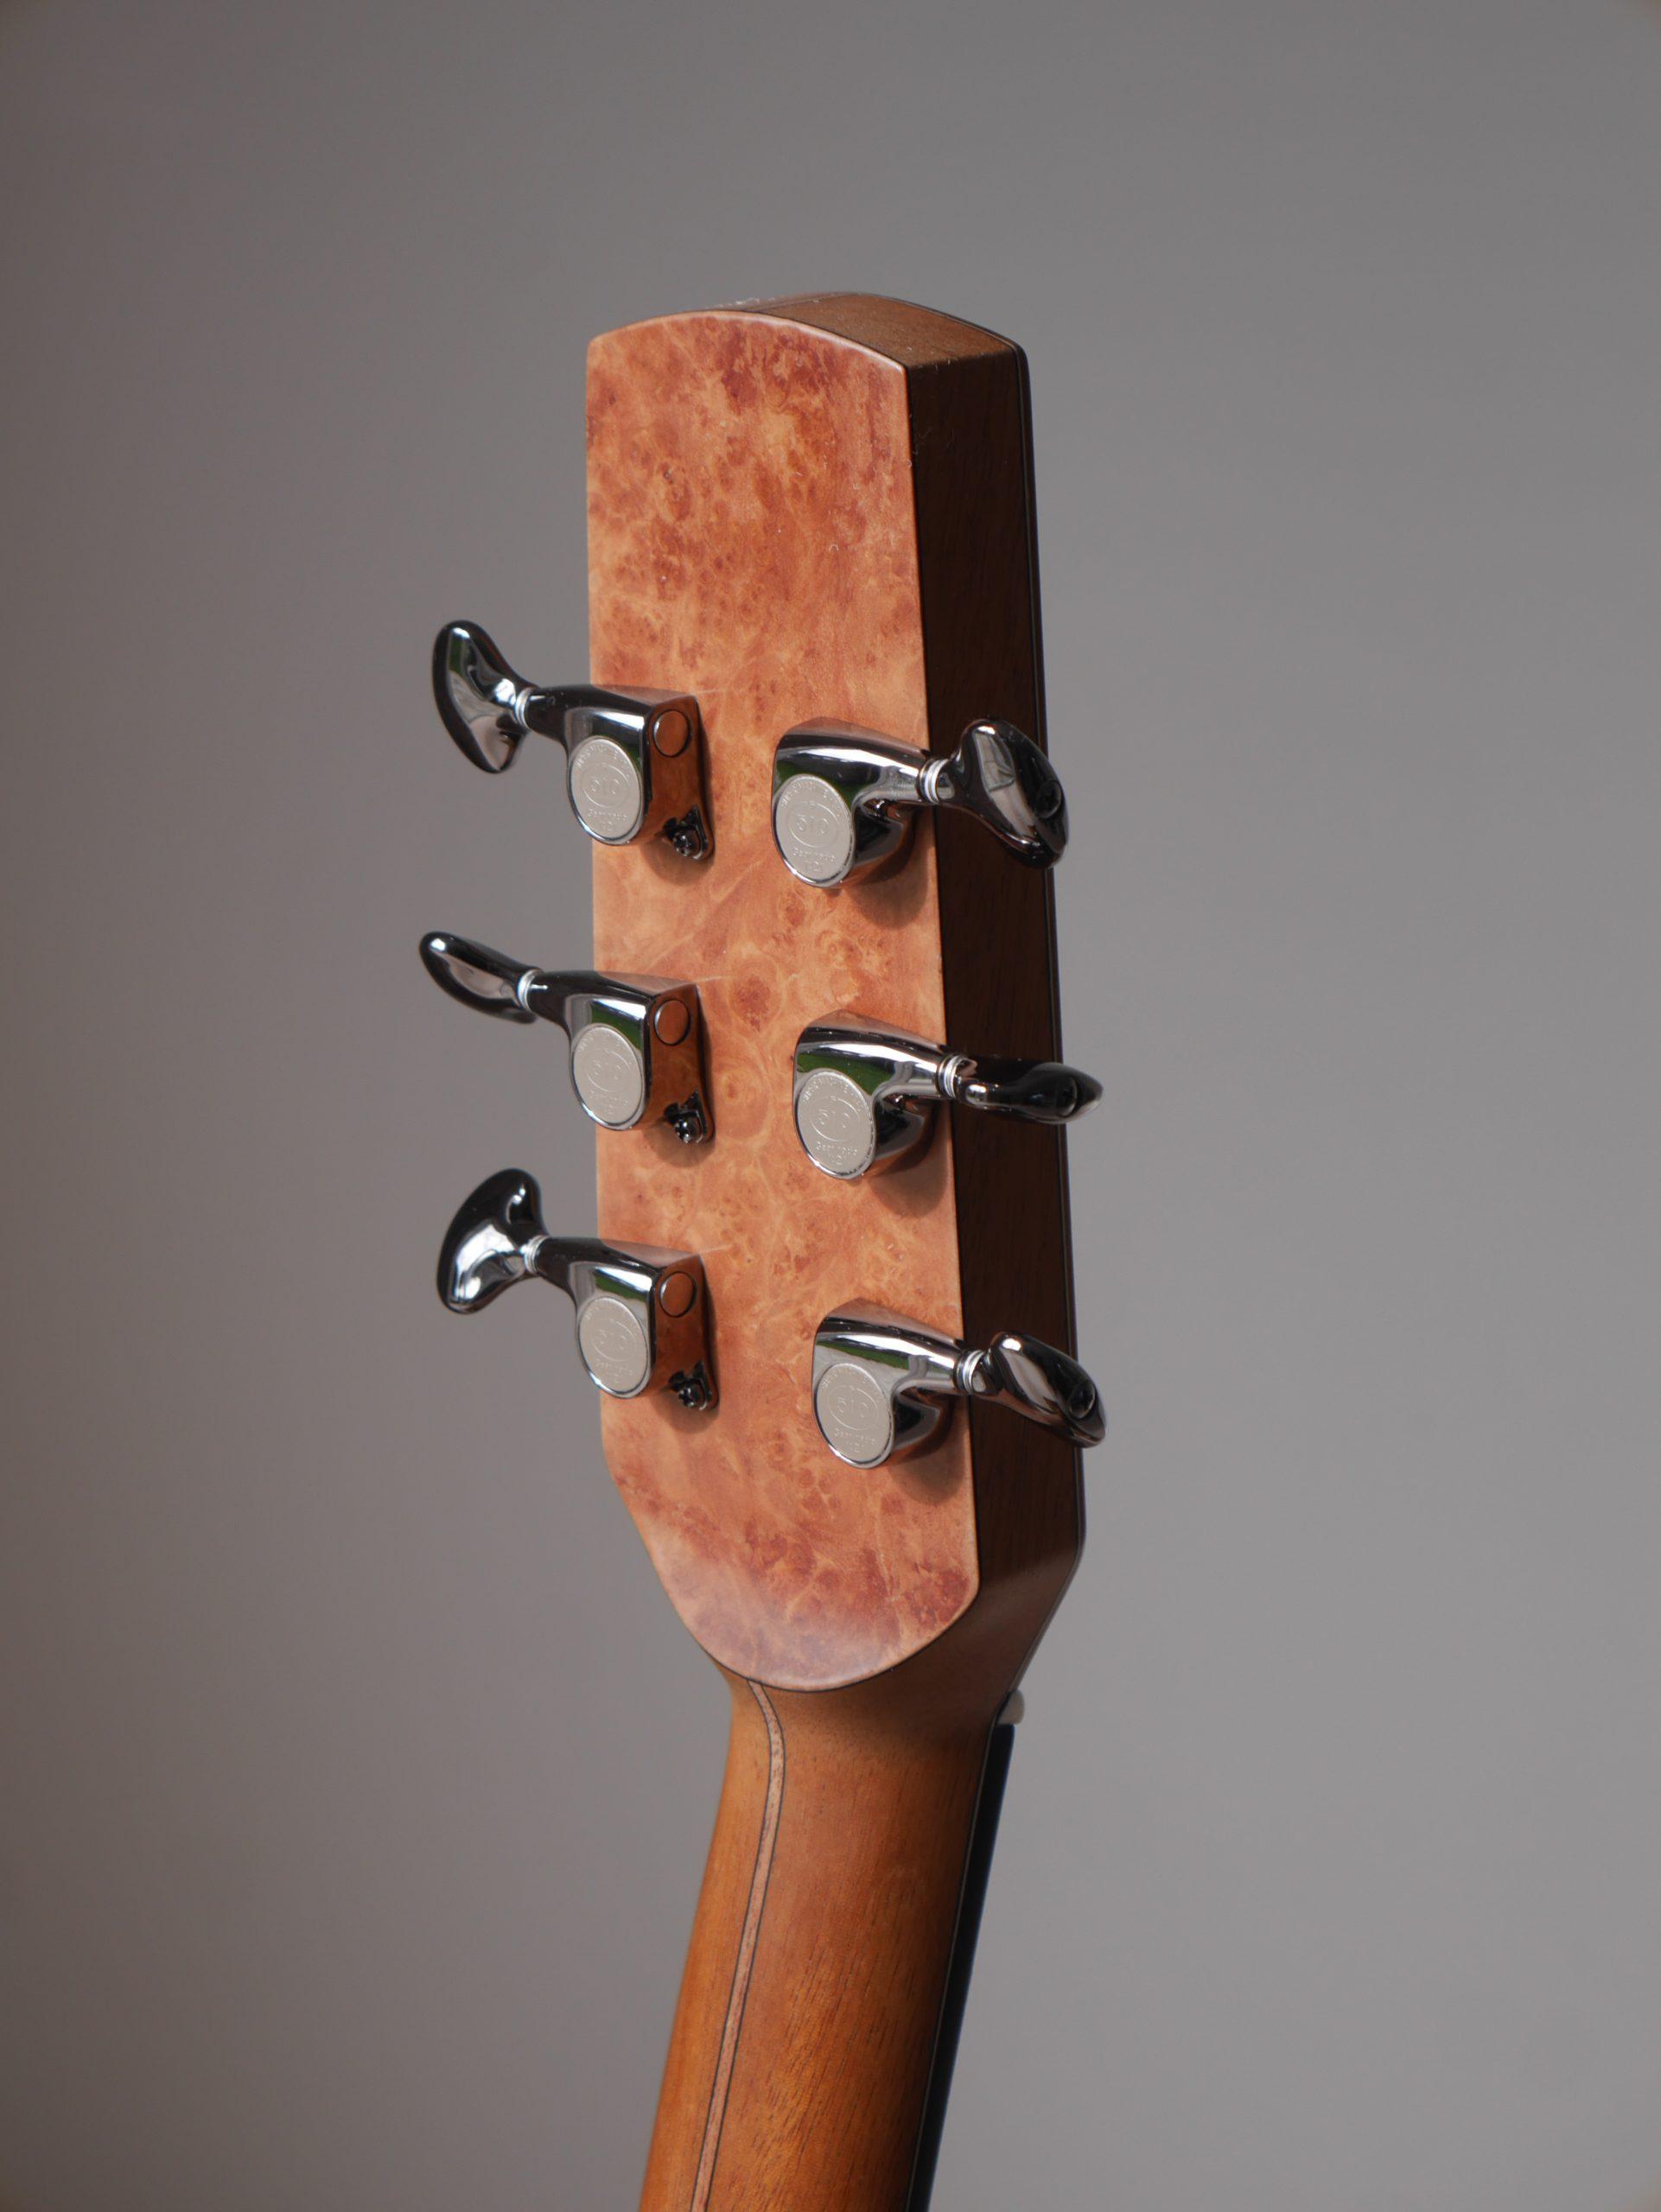 vavona burl, headstock, gotoh, gotoh 510, machinheads, tuners, montgomery, acoustic, luthier